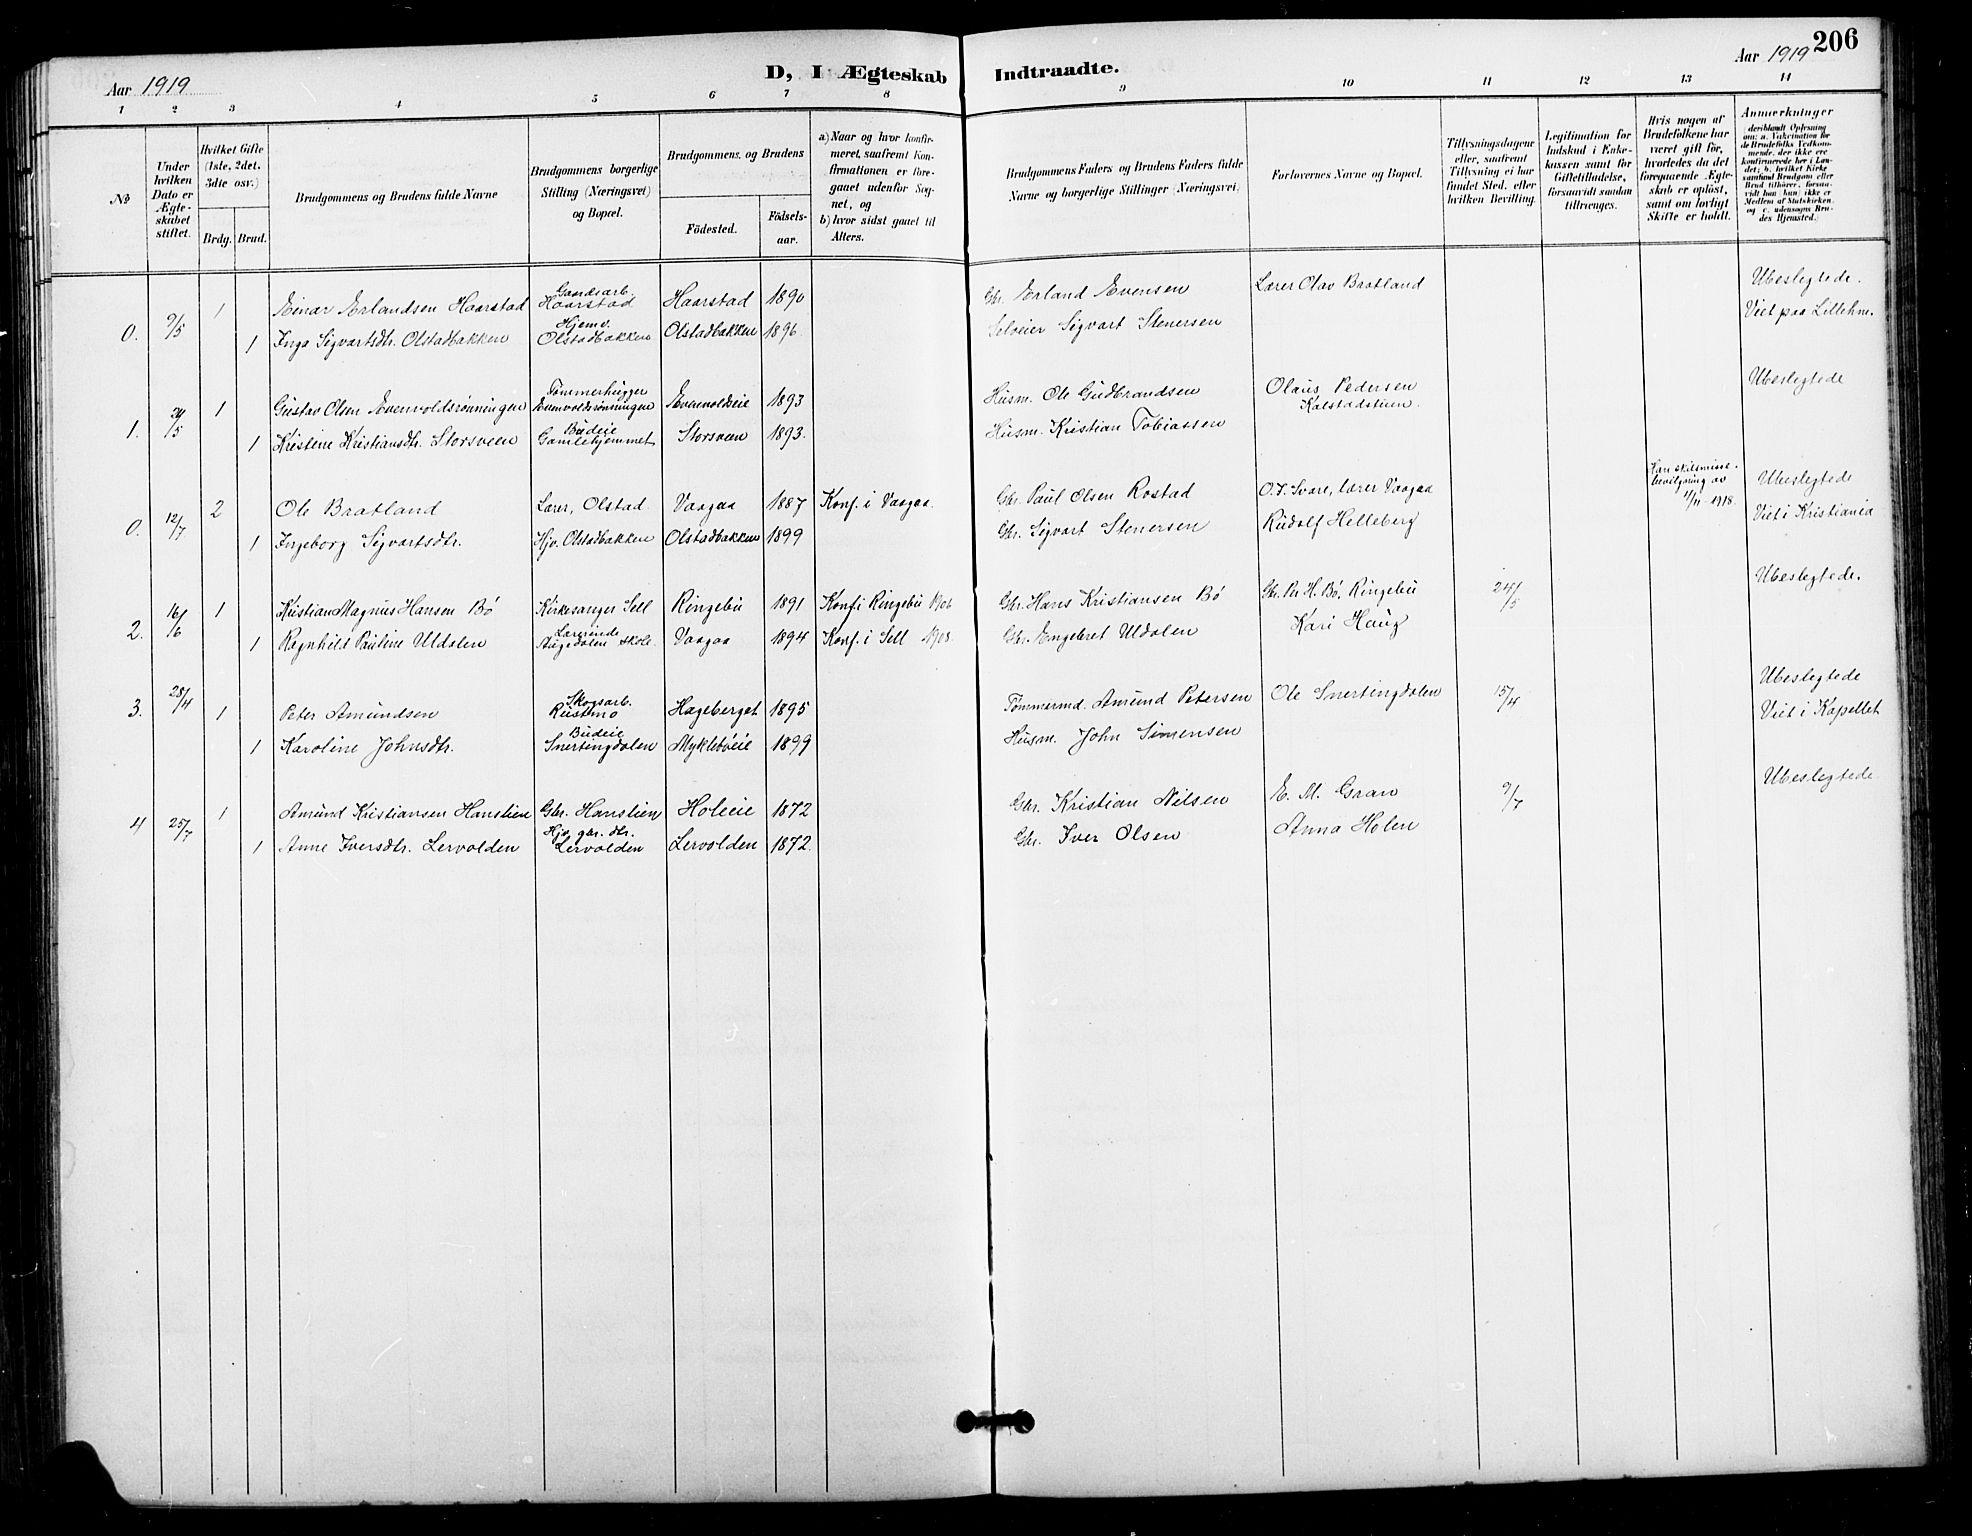 SAH, Vestre Gausdal prestekontor, Klokkerbok nr. 3, 1896-1925, s. 206